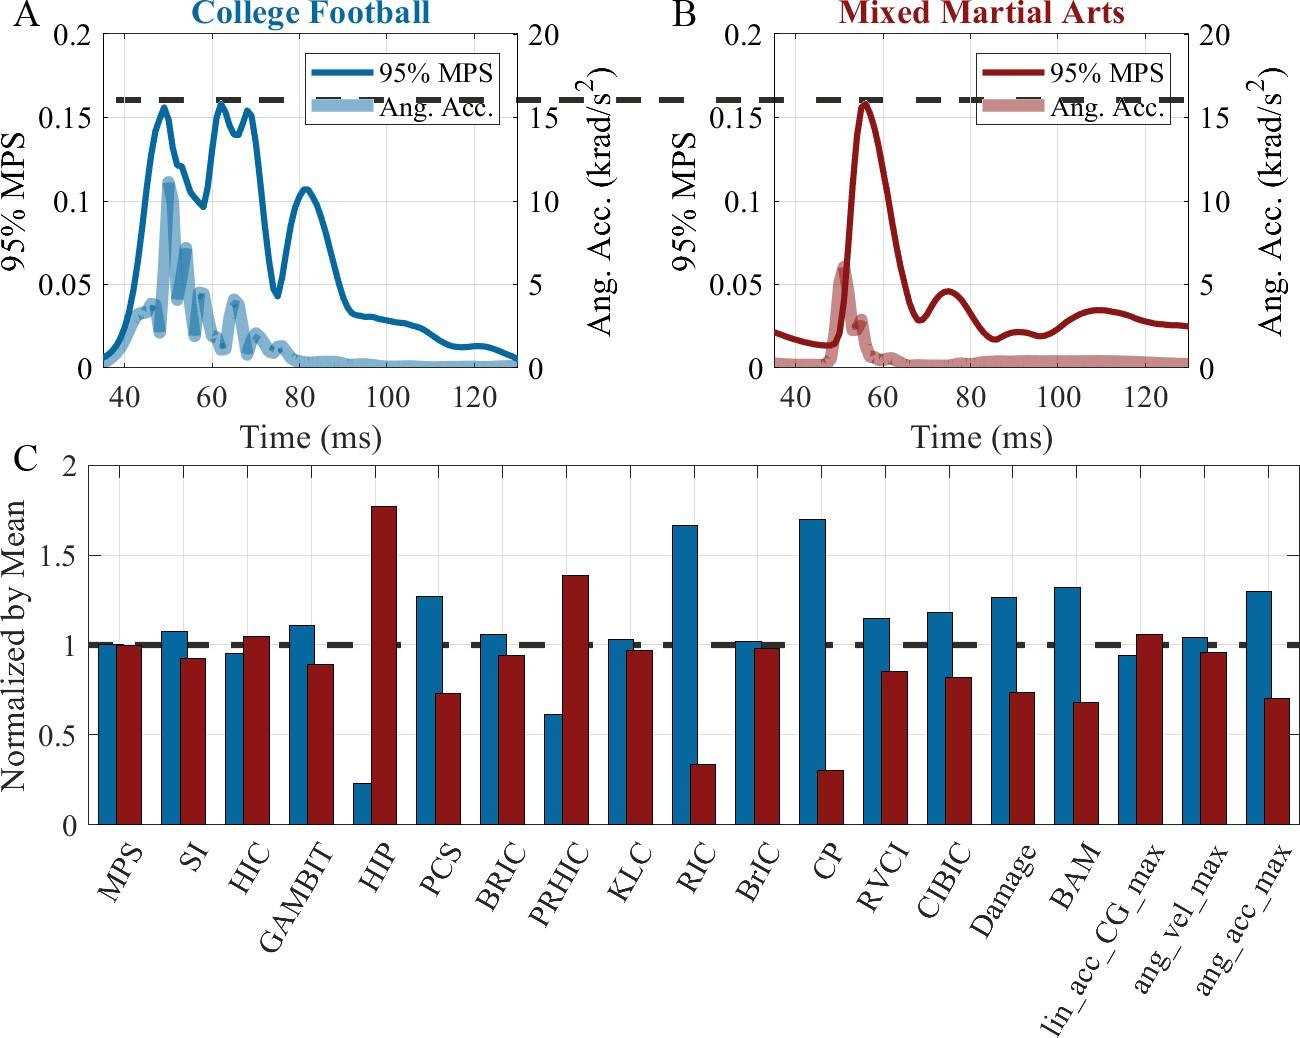 Figure 1 for Prediction of brain strain across head impact subtypes using 18 brain injury criteria